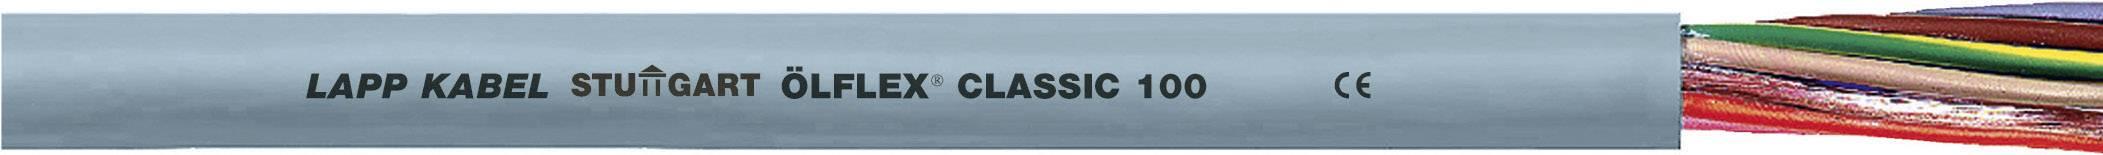 Kabel LappKabel Ölflex CLASSIC 100 25G1 (0010056), PVC, 14,7 mm, 500 V, šedá, 50 m